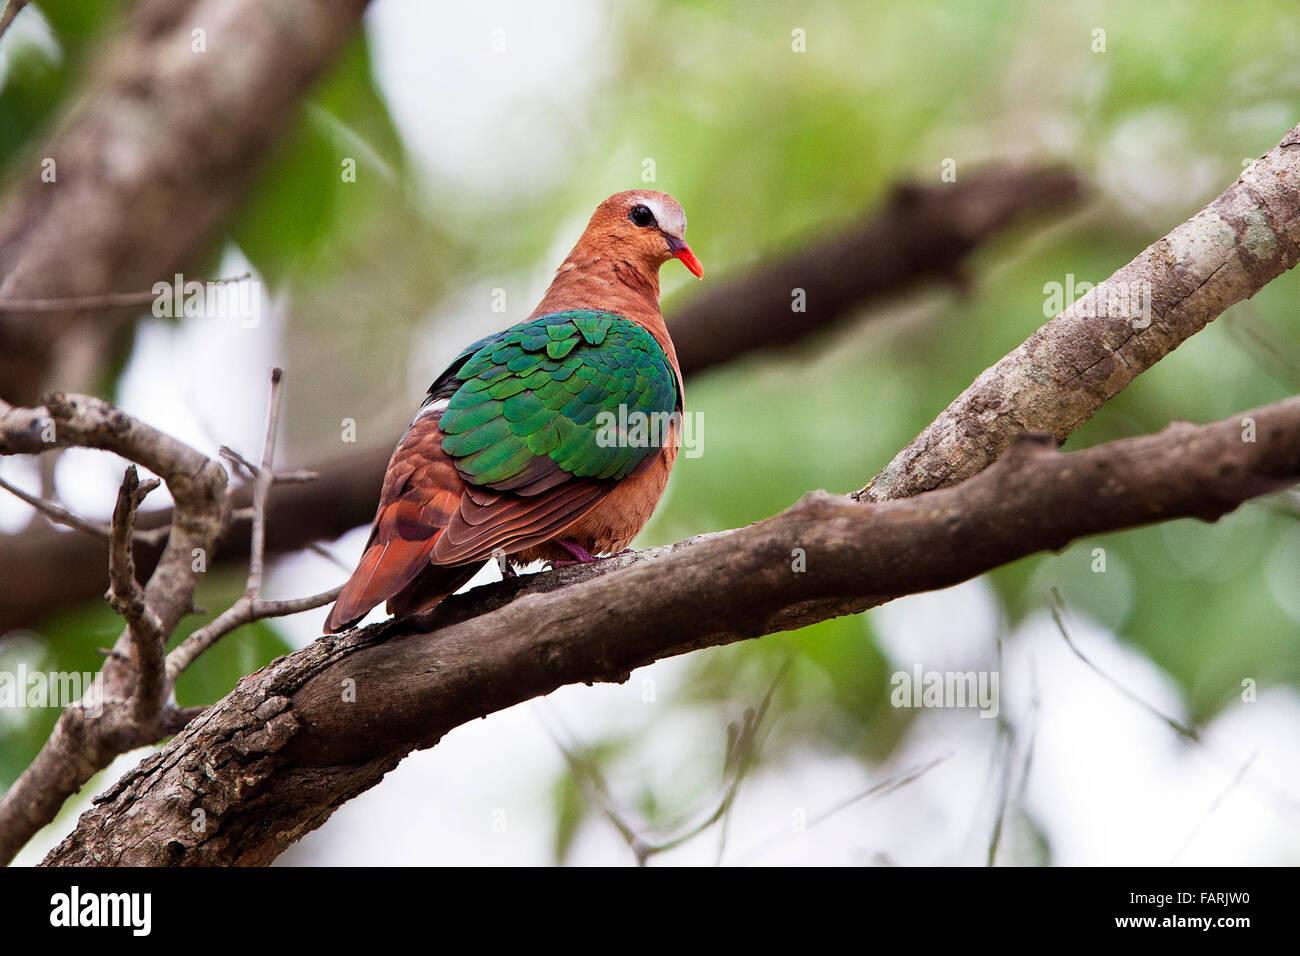 Emerald Dove Bird at Bandhavgarh National Park - Stock Image